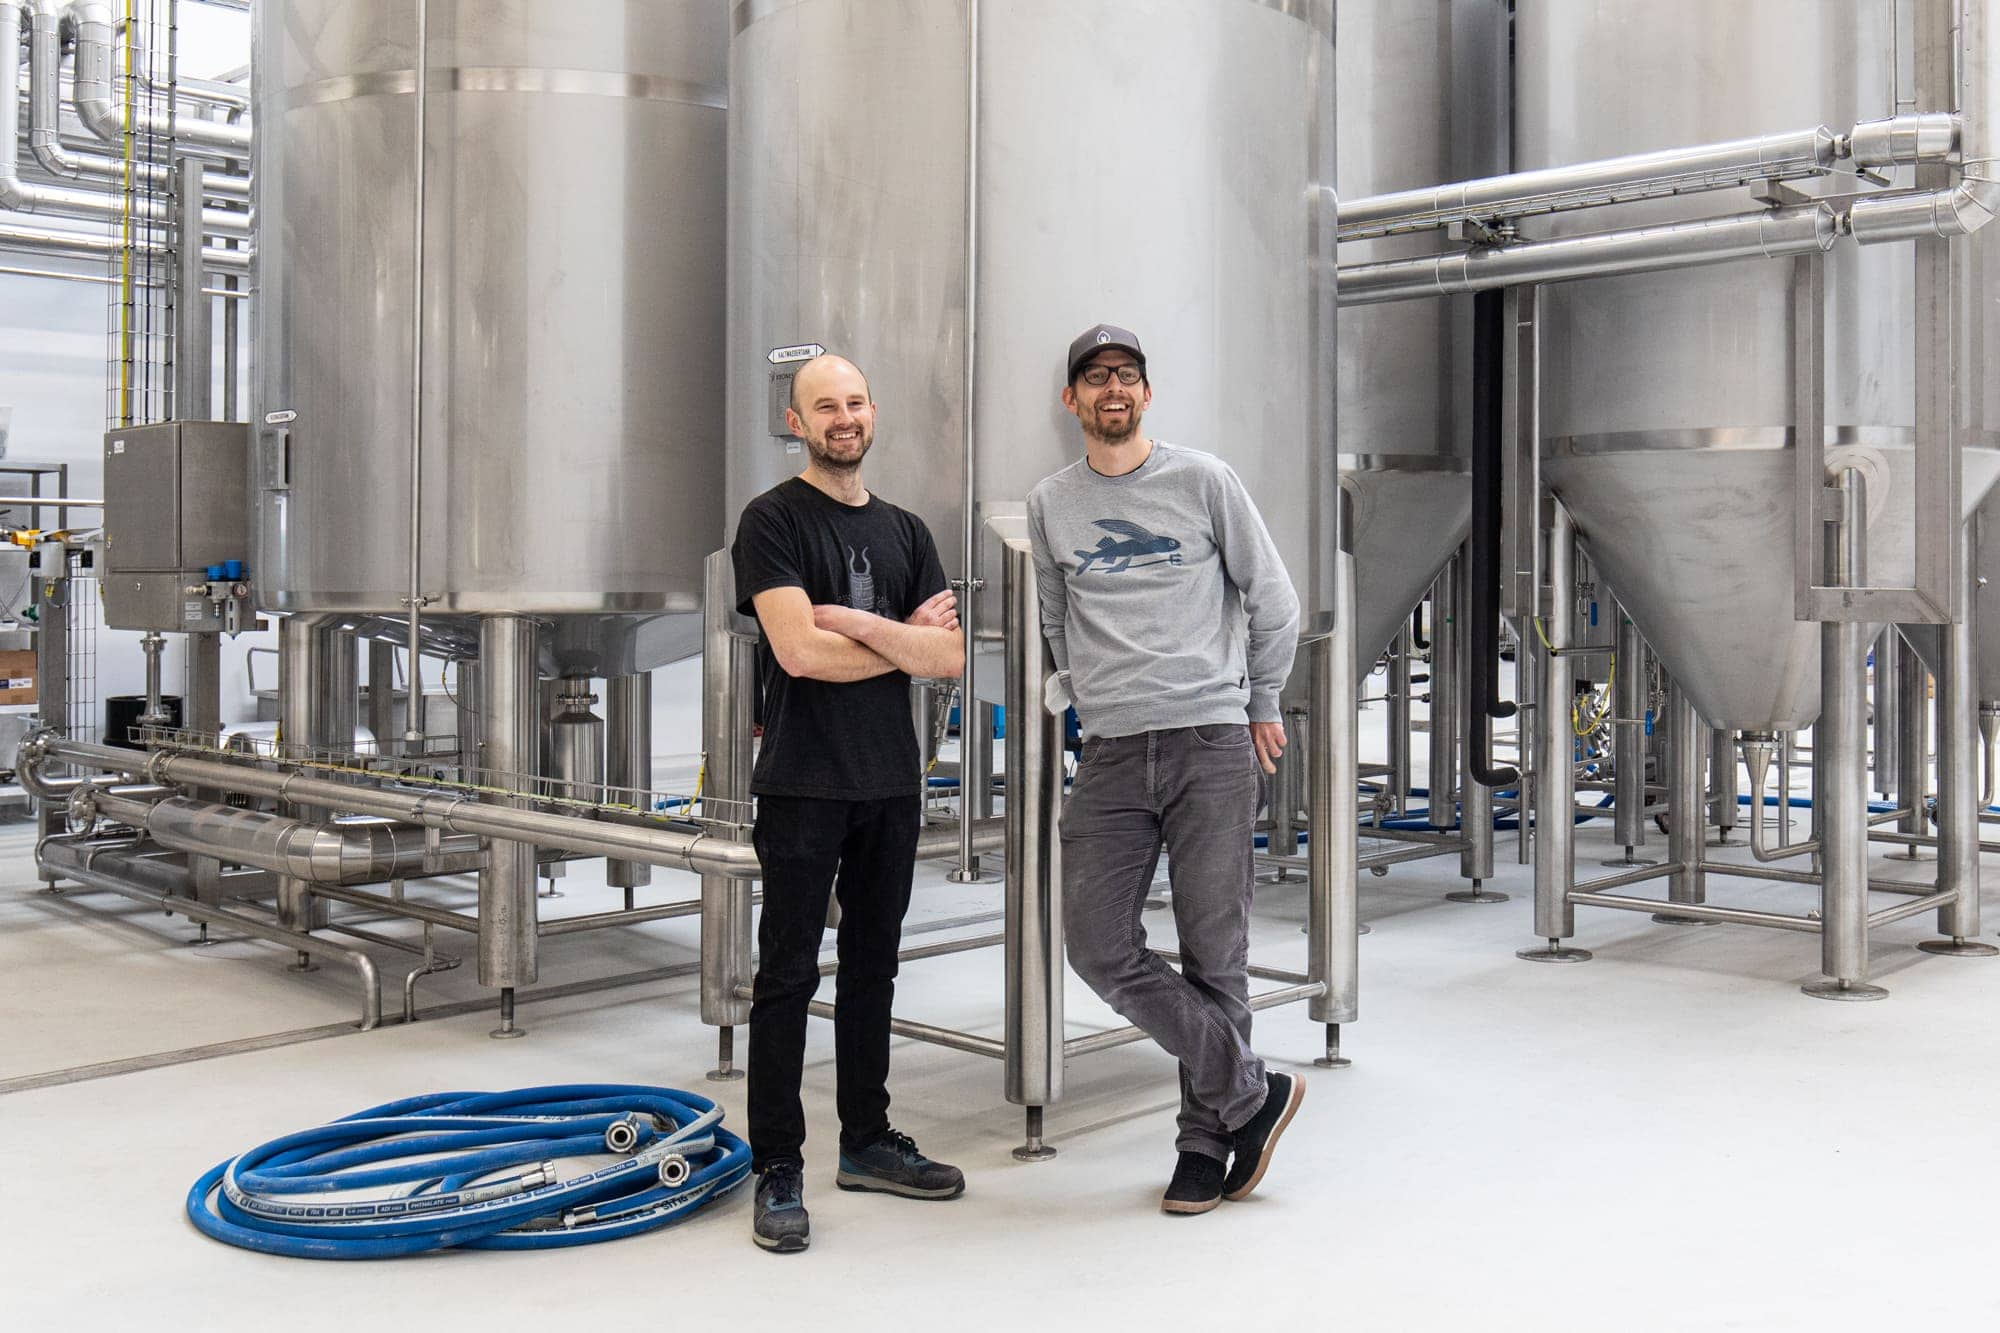 Georg and Lukasz at the new FUERST WIACEK Brewery in Berlin Siemensstadt